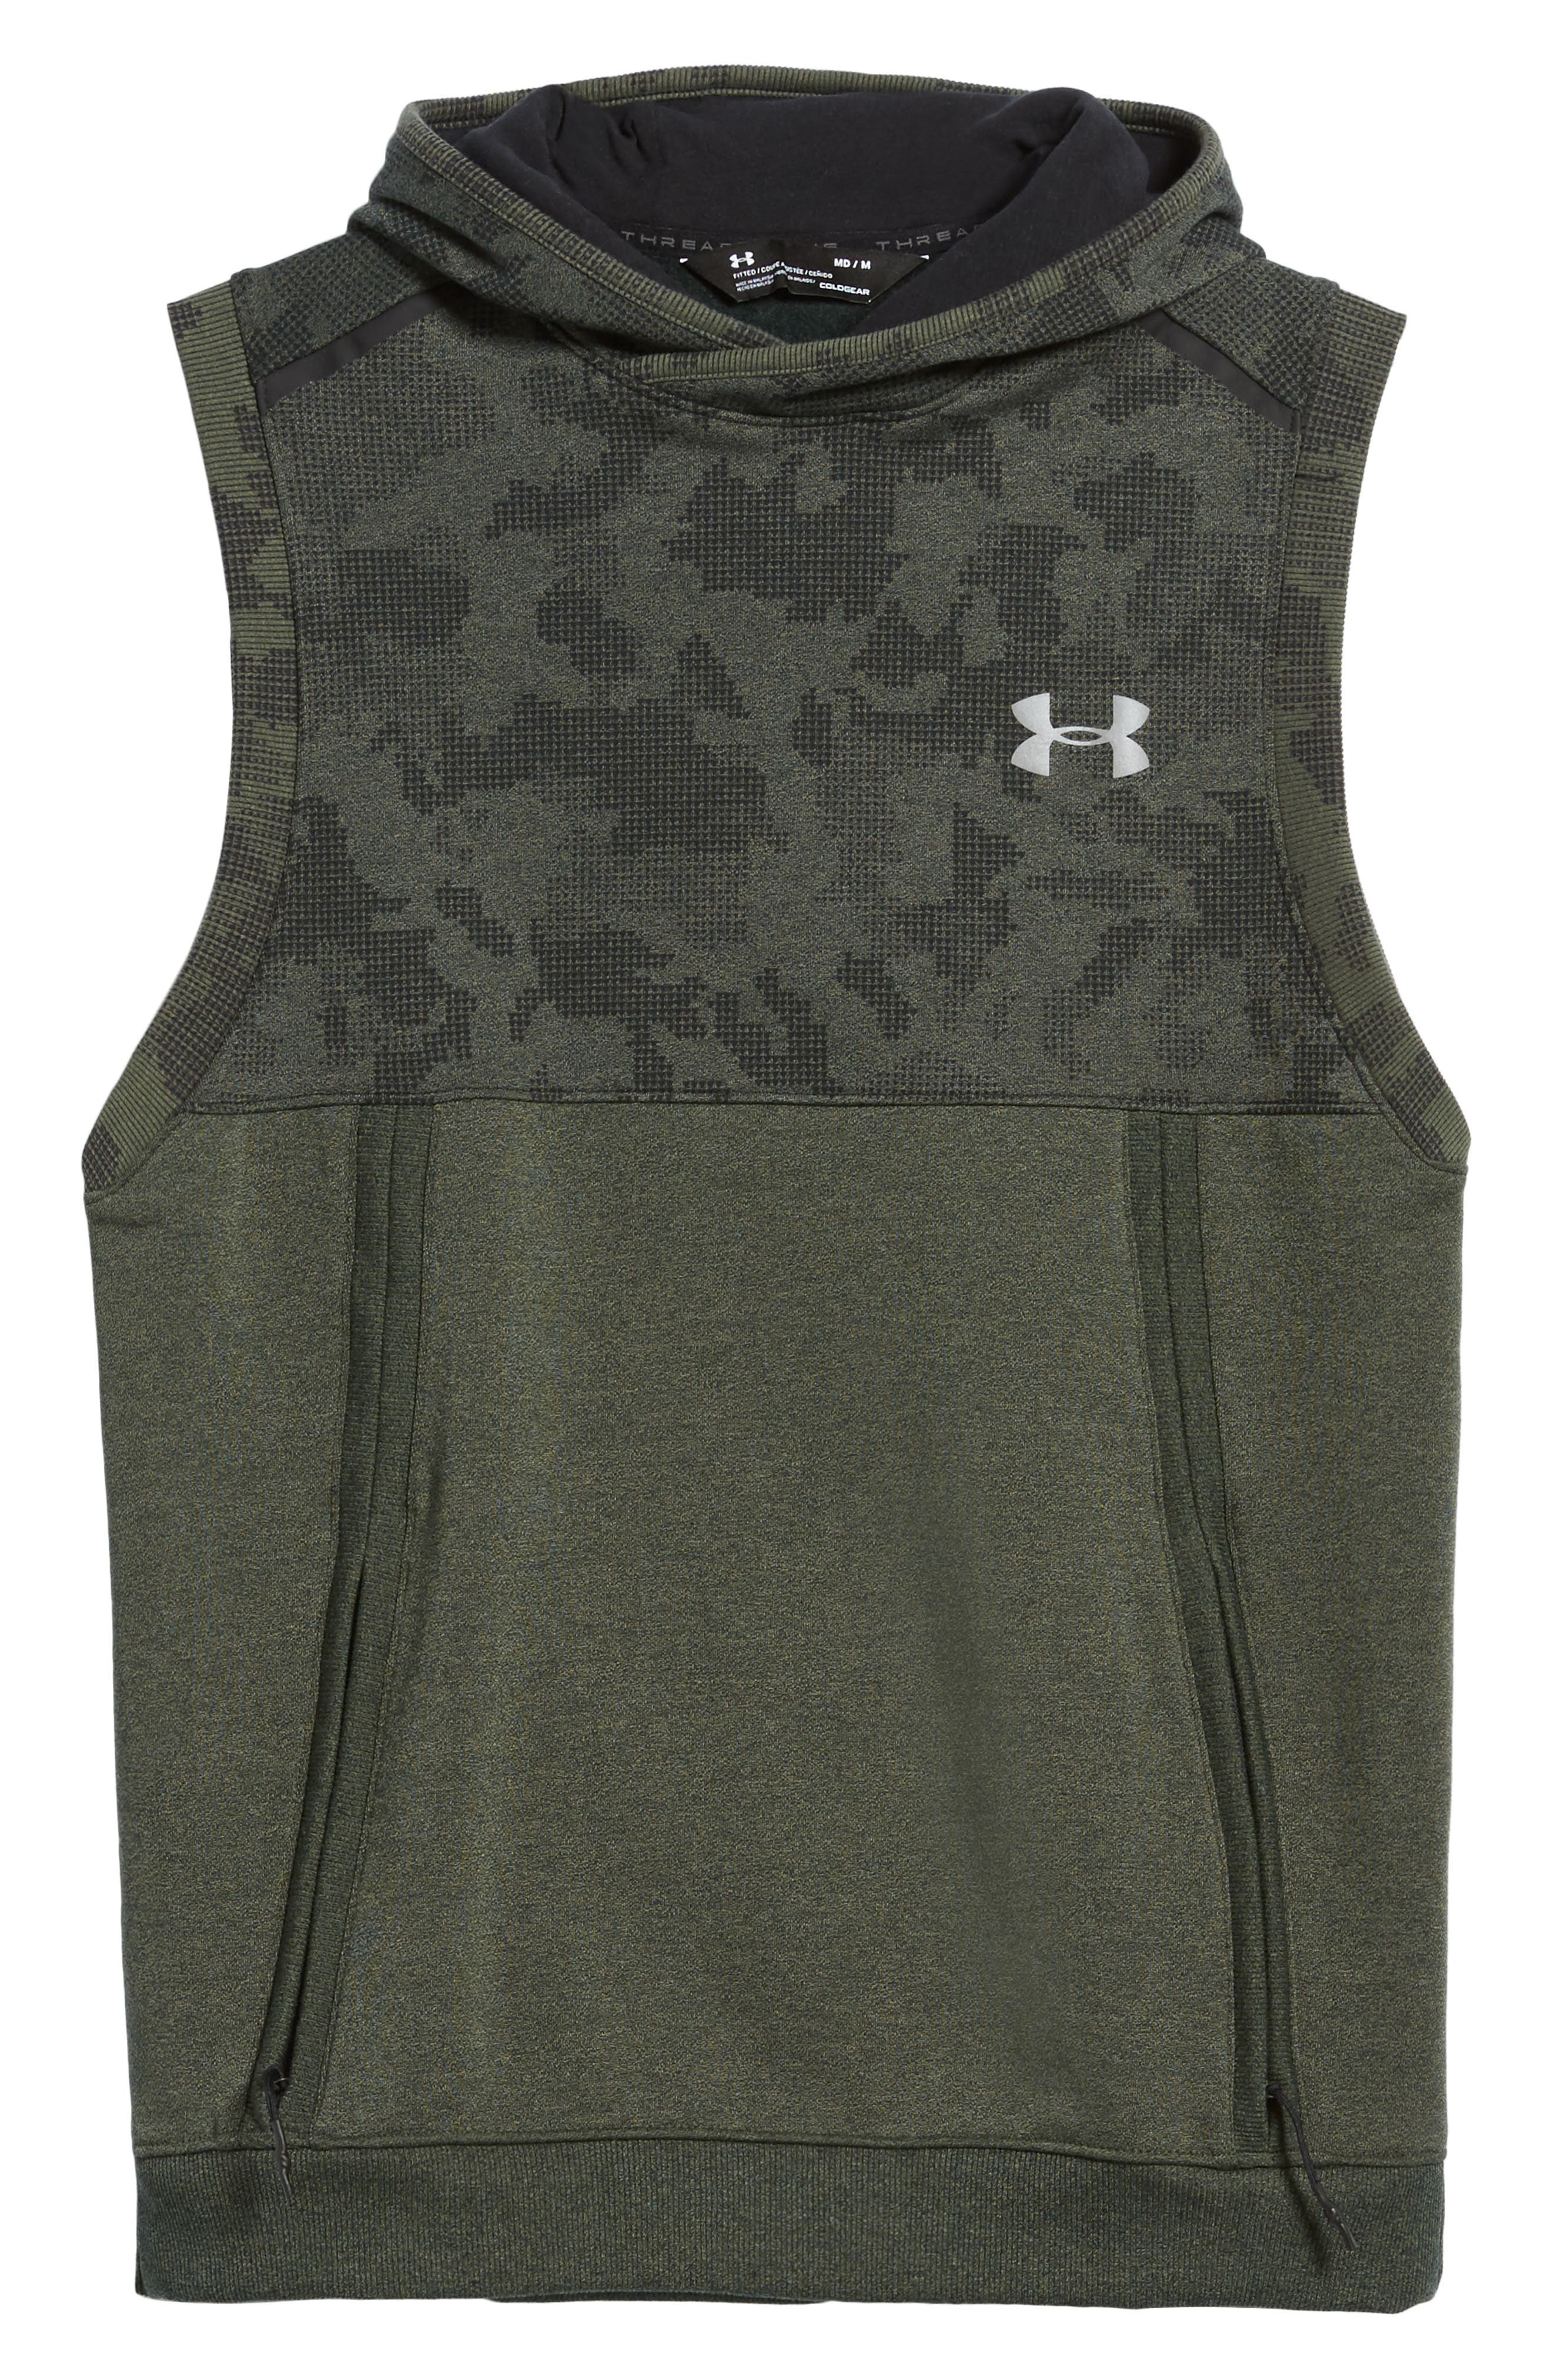 Threadborne Hooded Vest,                             Alternate thumbnail 6, color,                             Downtown Green / Refletive